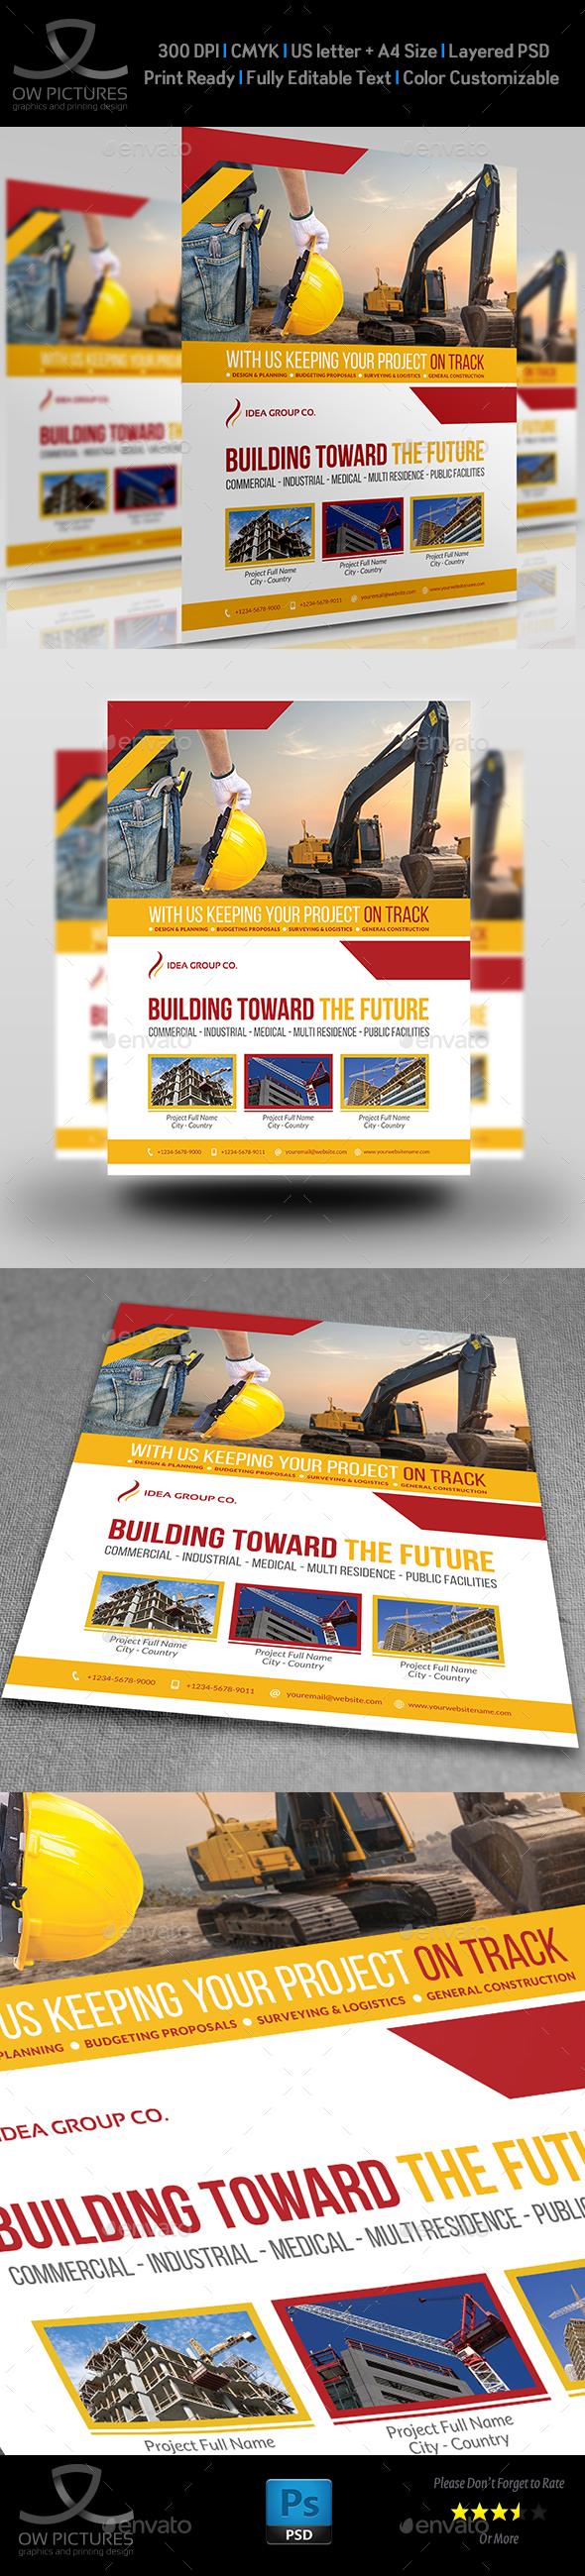 Construction Business Flyer Vol.6 - Flyers Print Templates